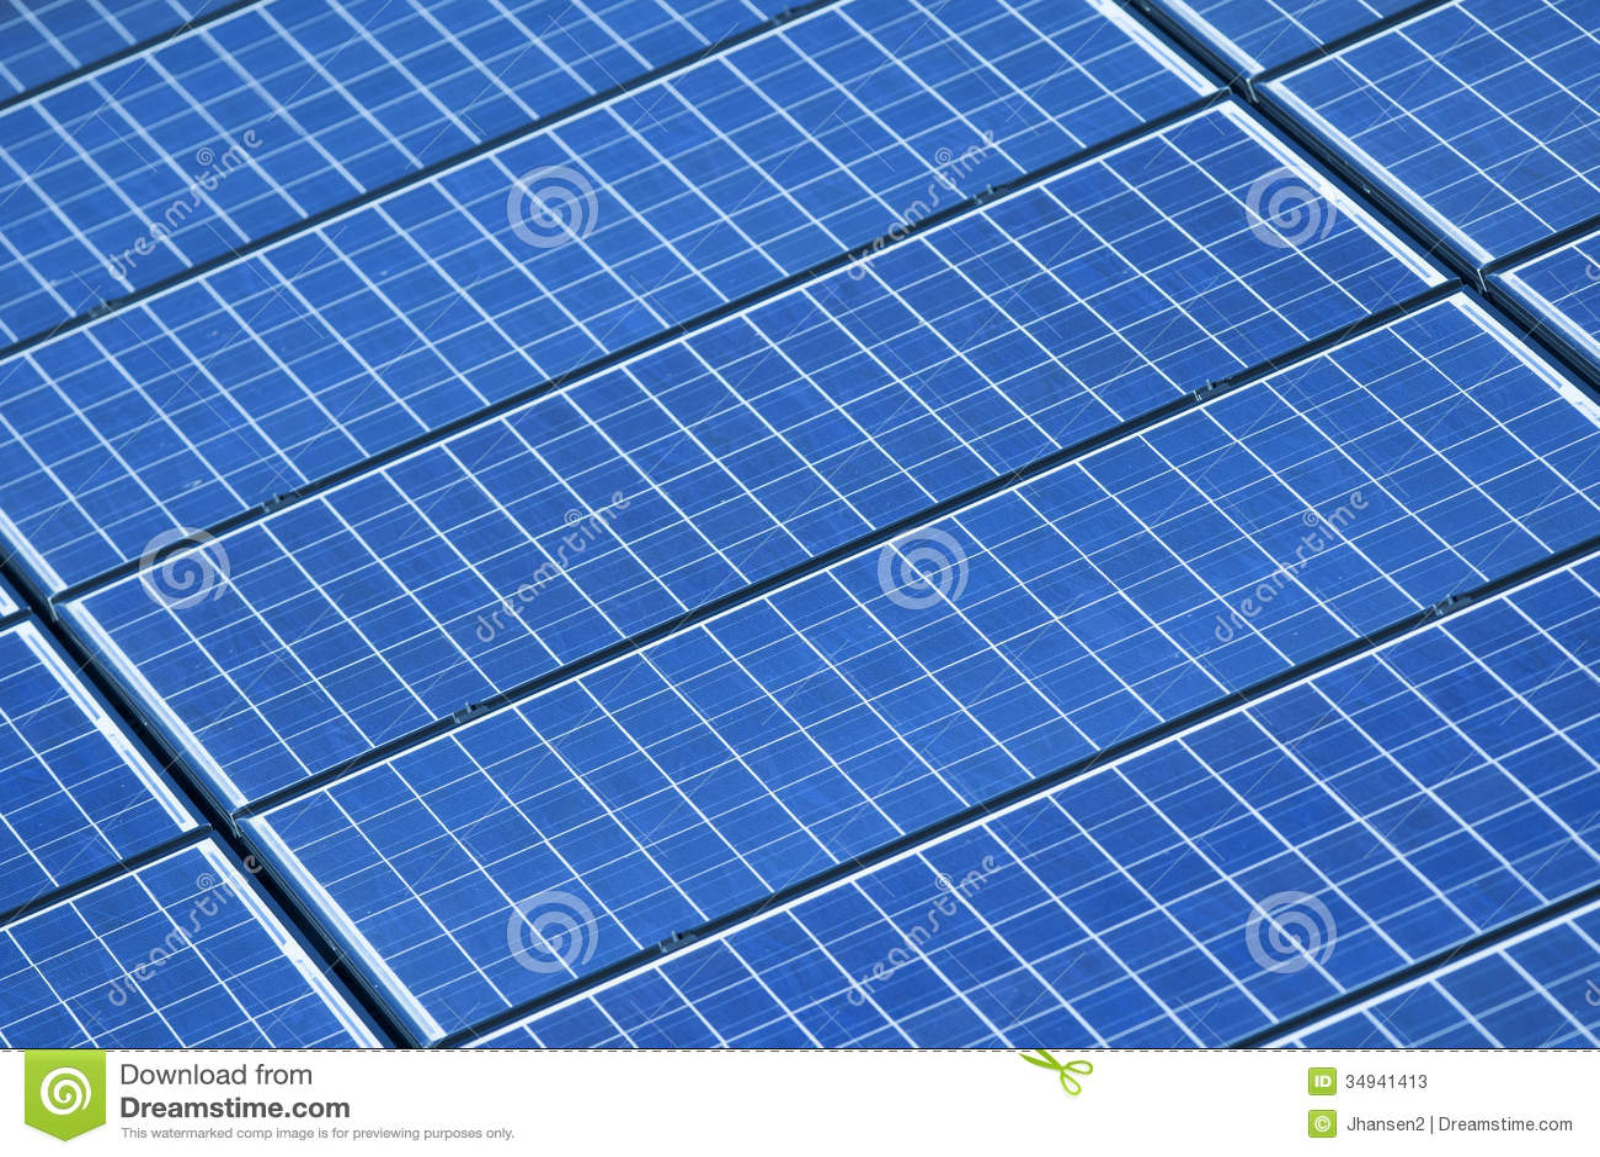 solar panel background - photo #28